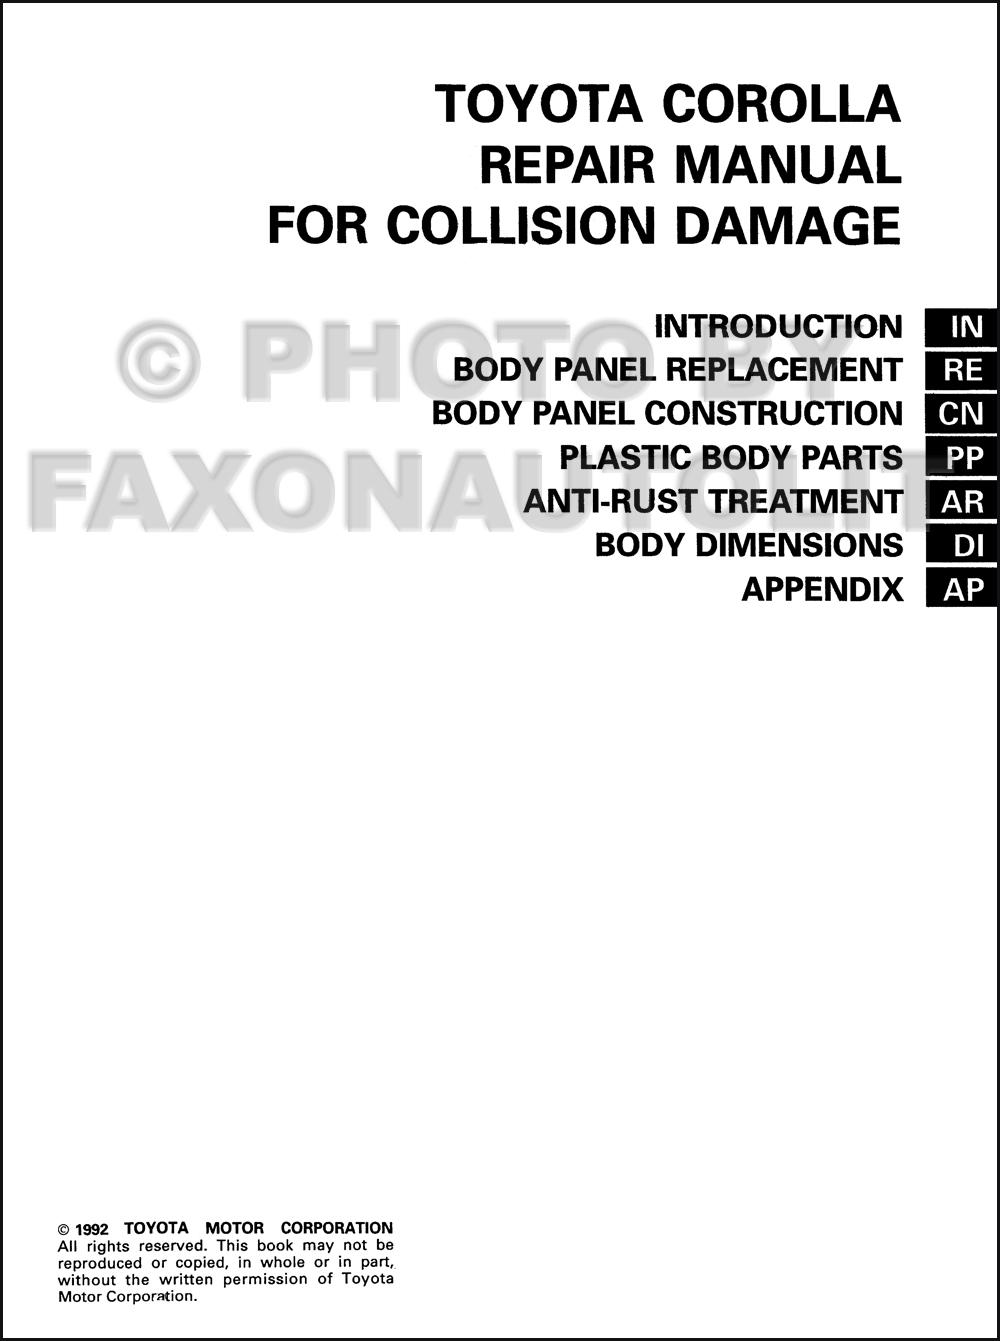 19931998 Toyota Corolla Body Collision Manual Original